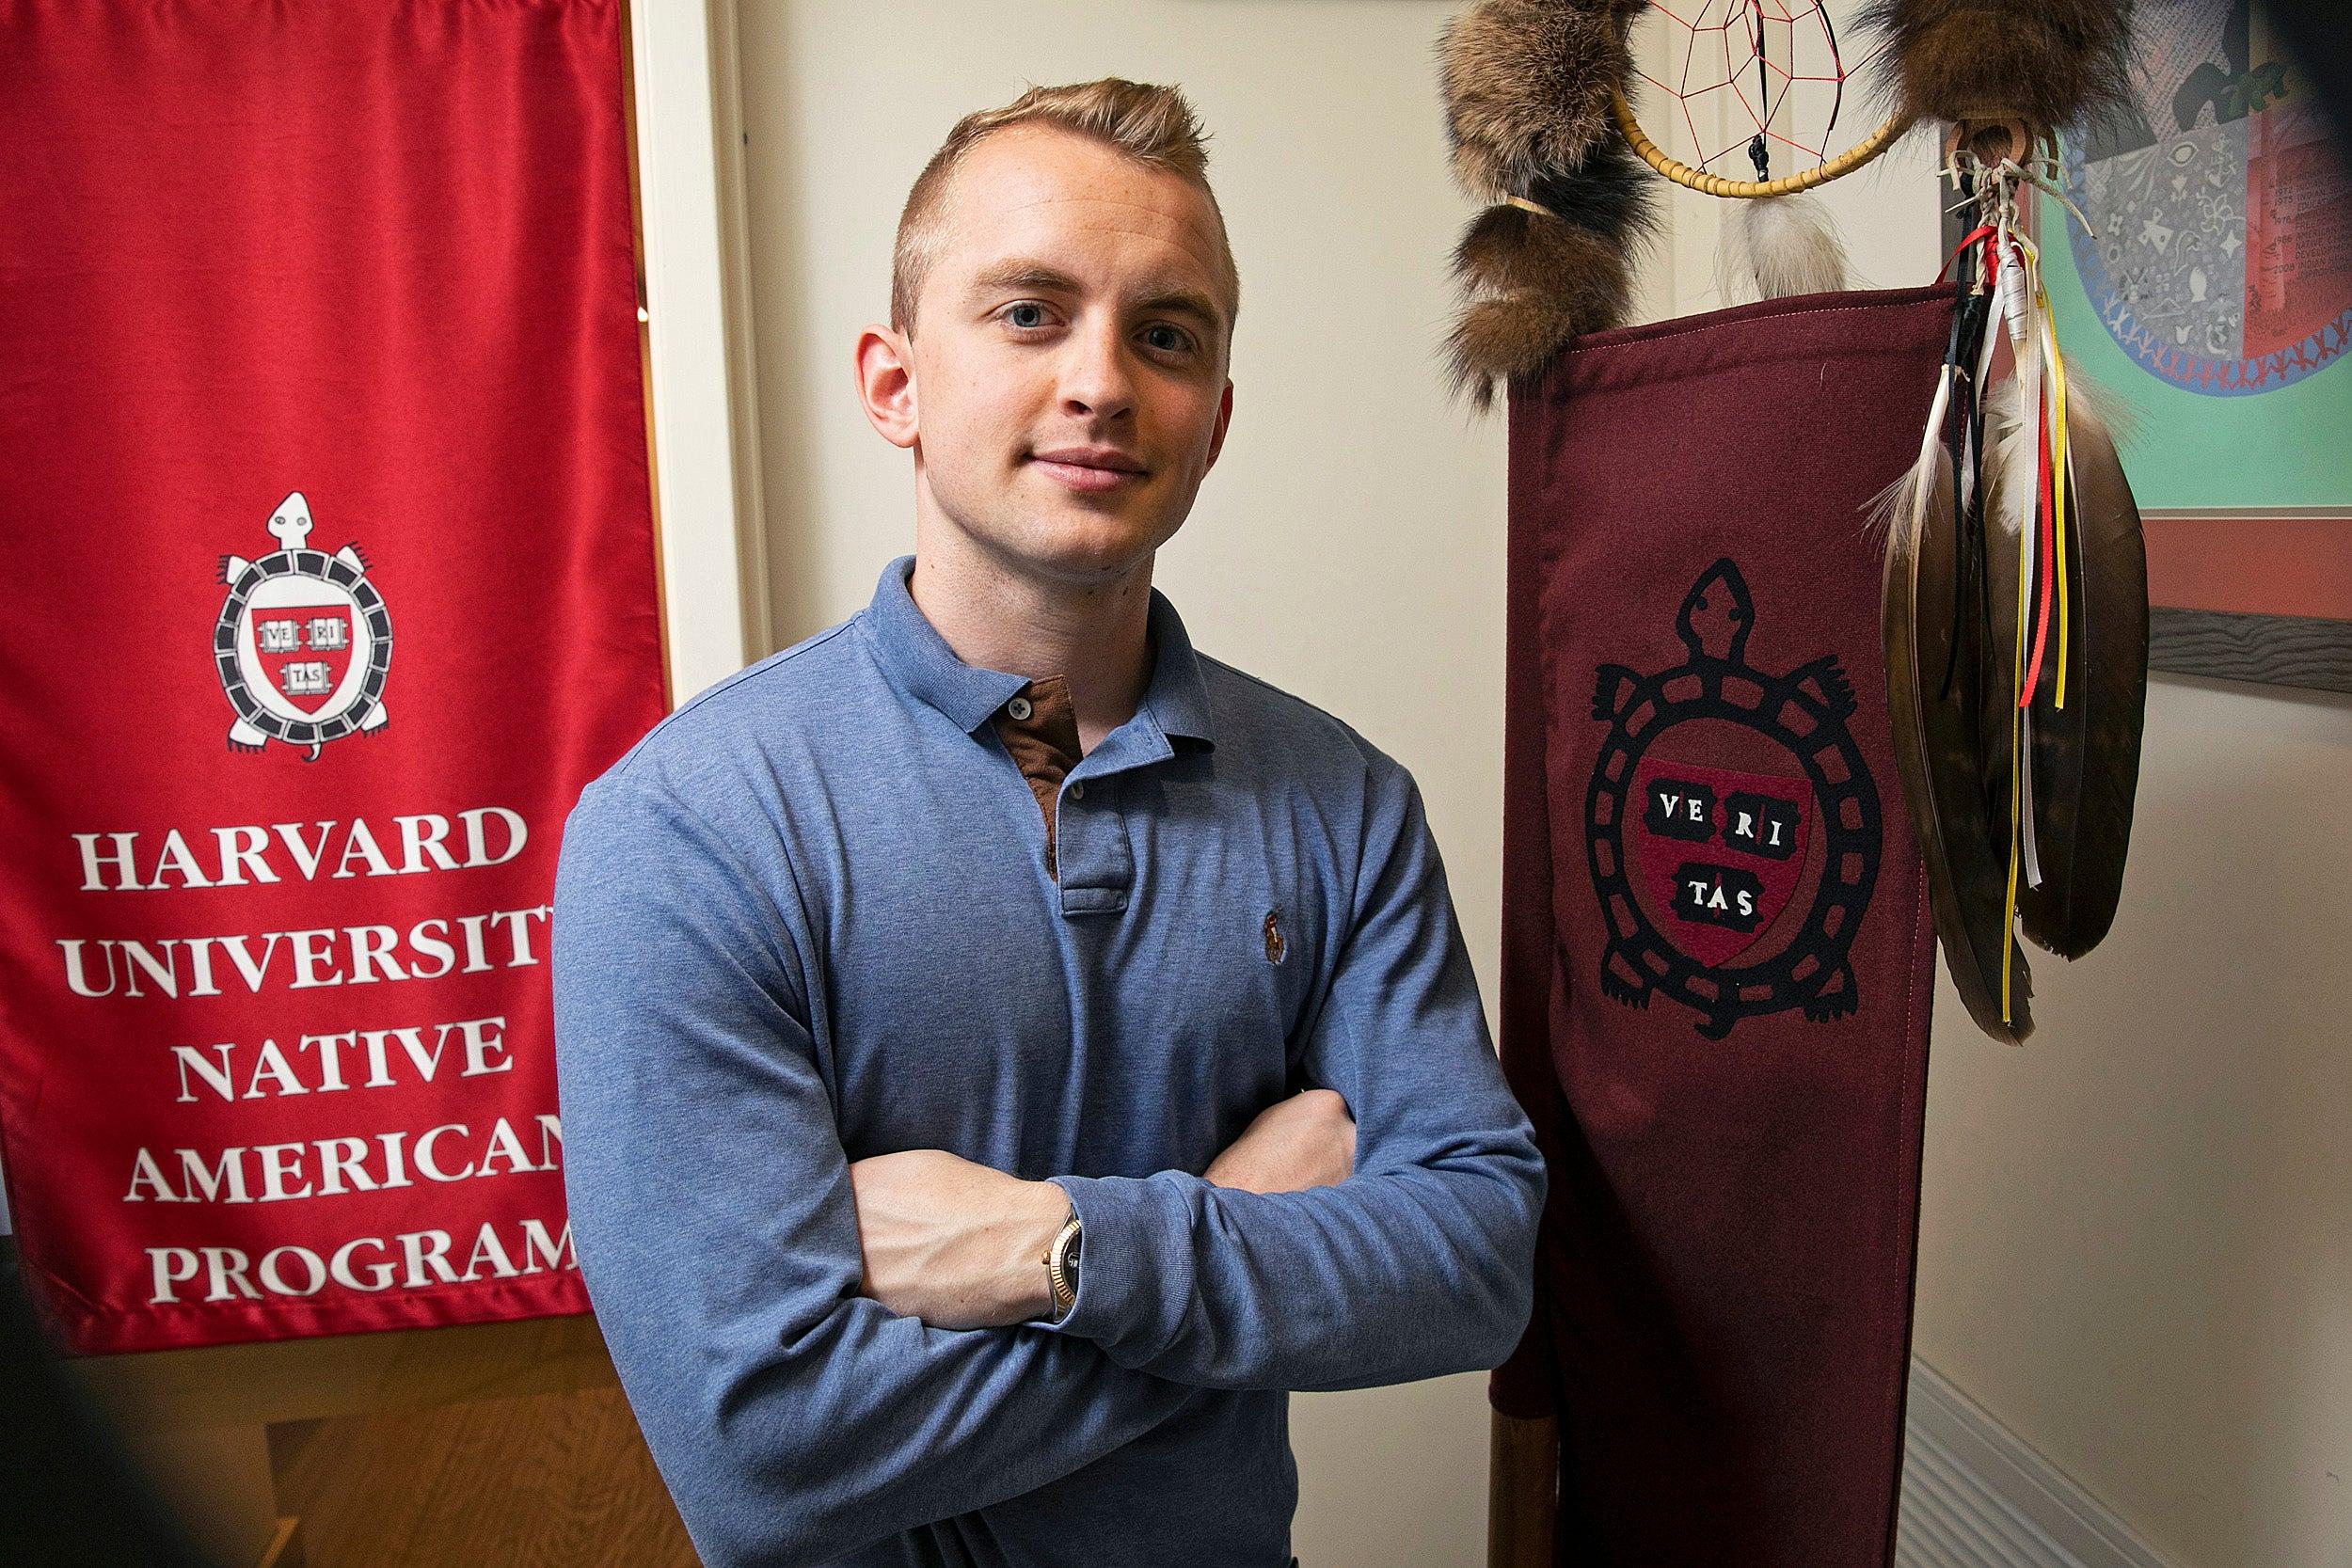 Truman Burrage, Indigenous activist, thrives at Harvard